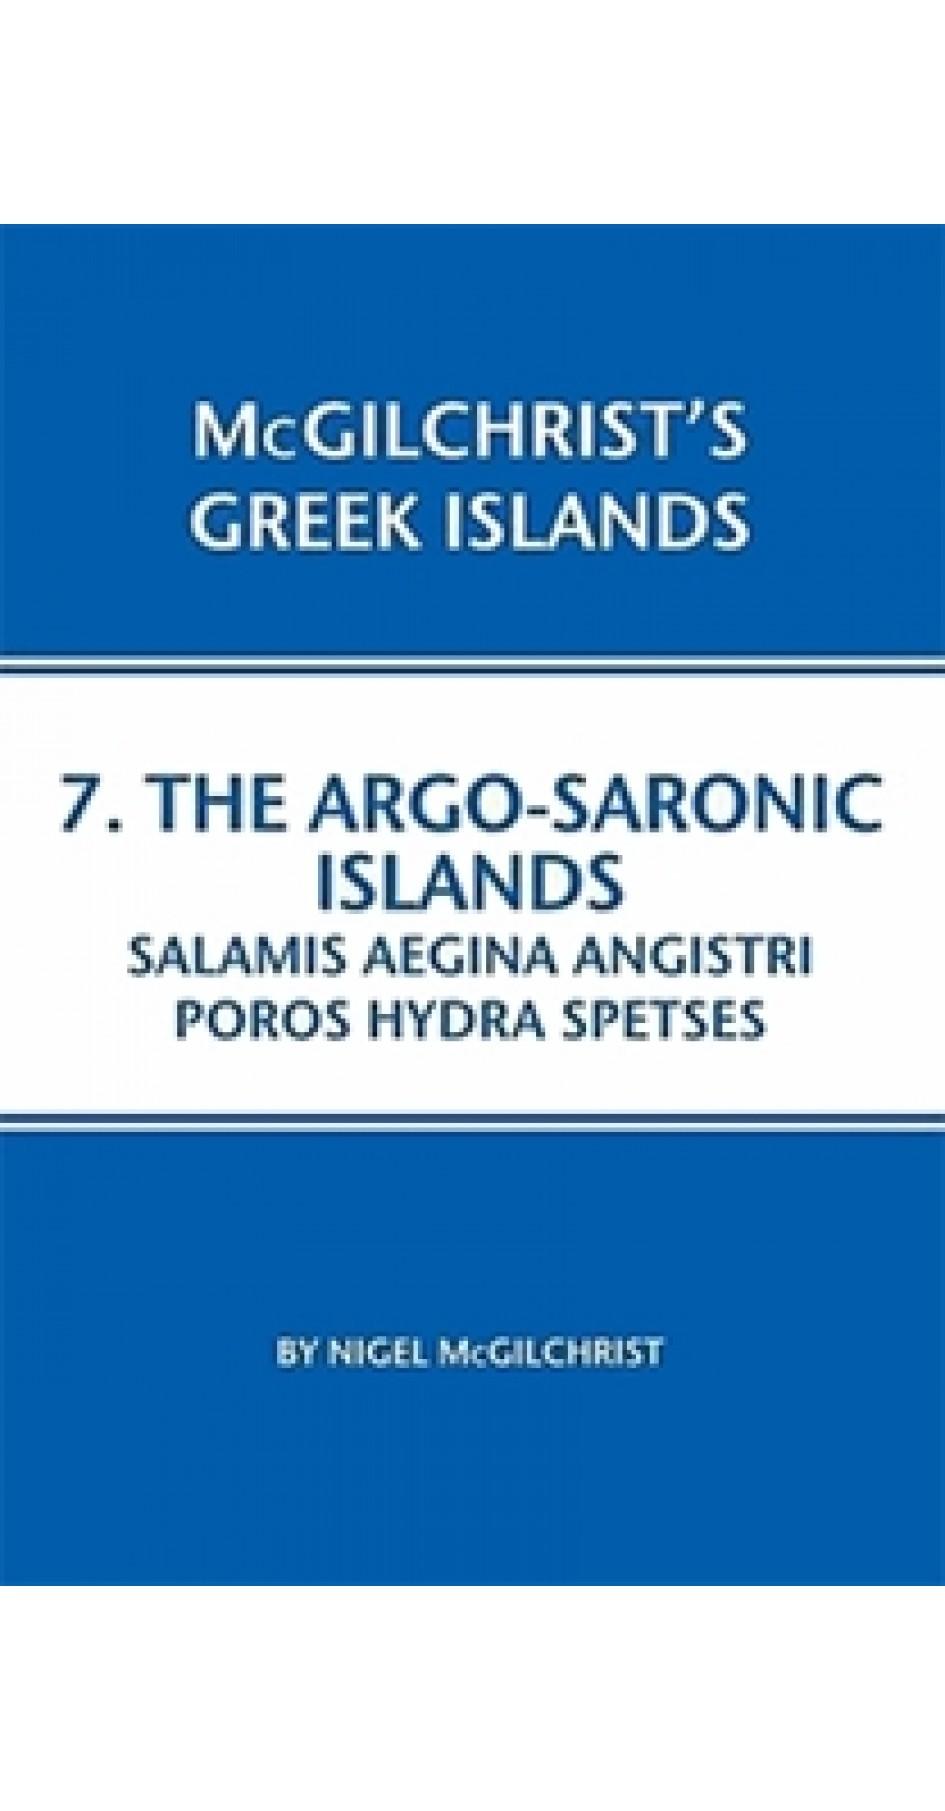 Salamis, Aegina, Angistri, Poros, Hydra and Spetses, The Argo-Saronic islands